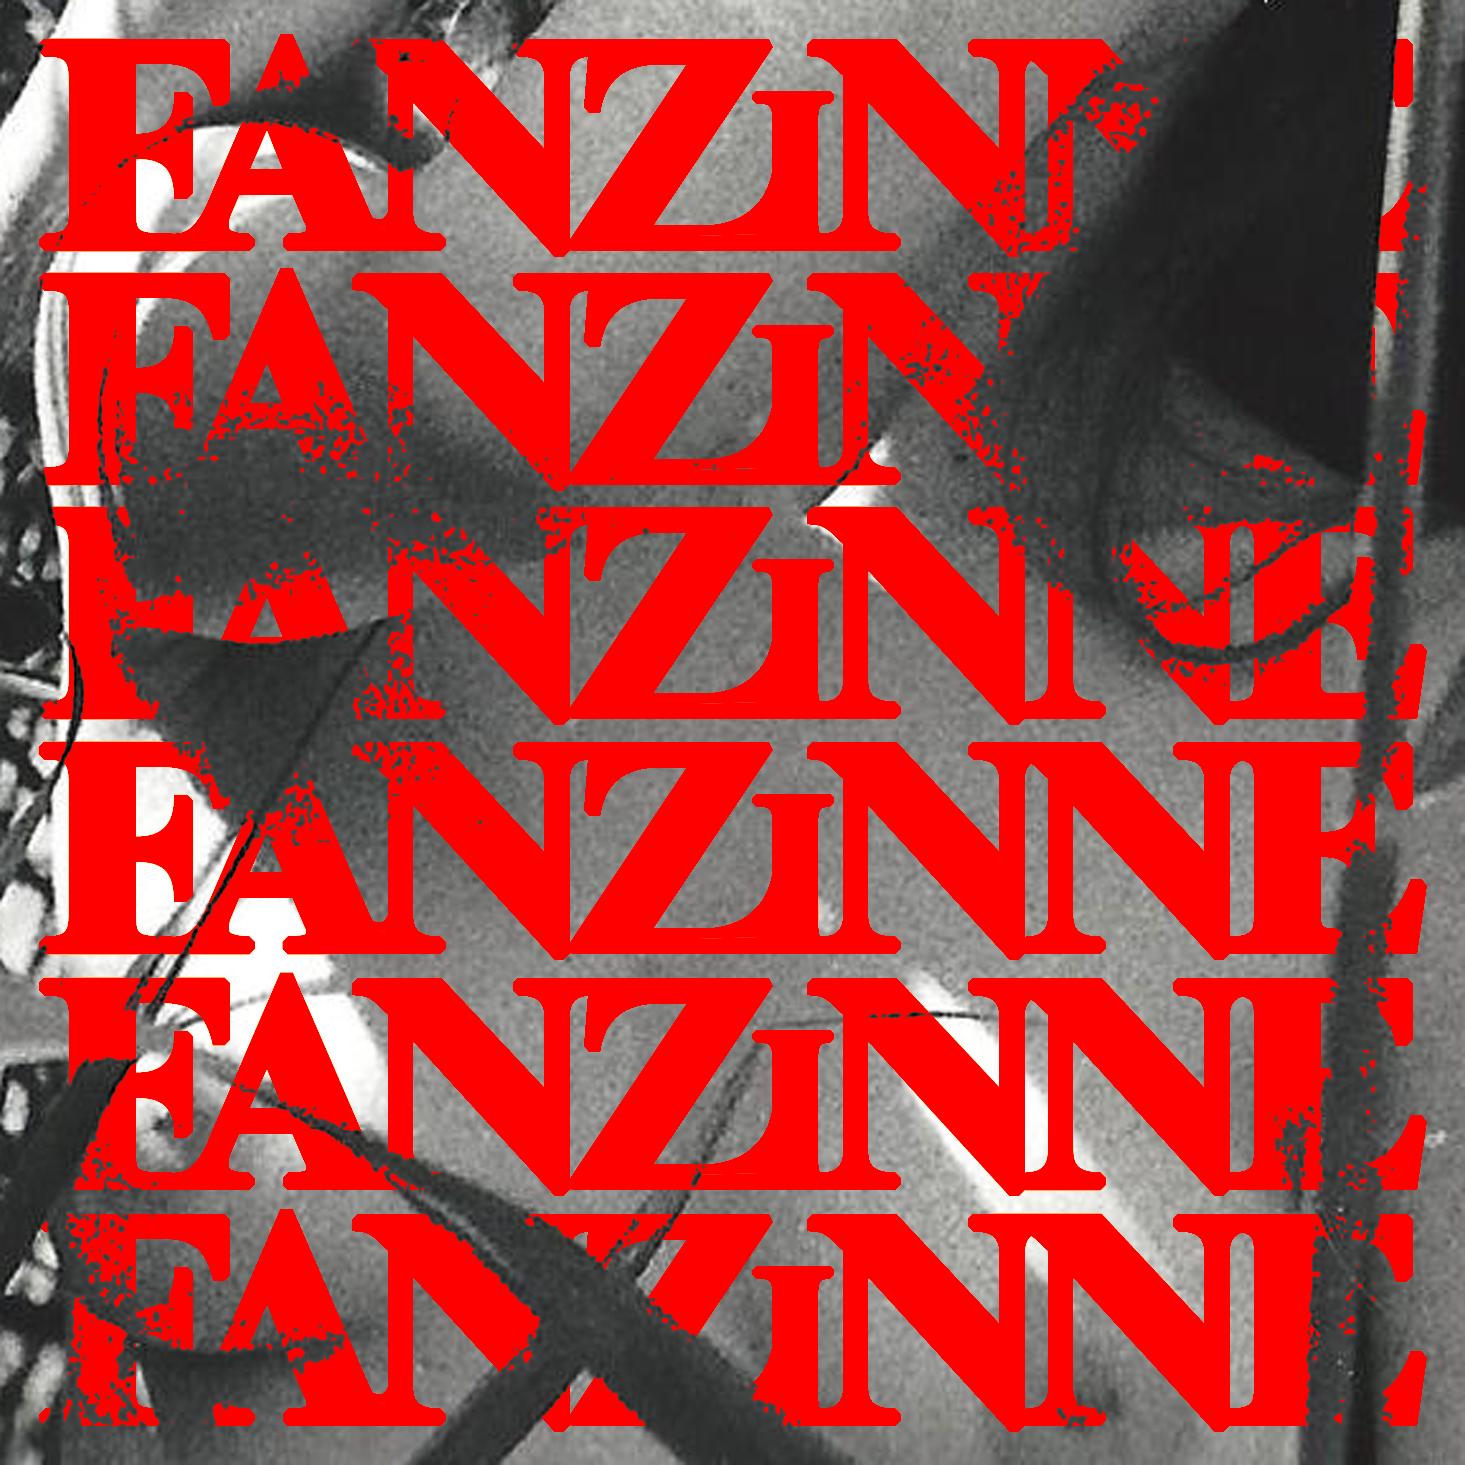 FANZINNE 1 - fanzine